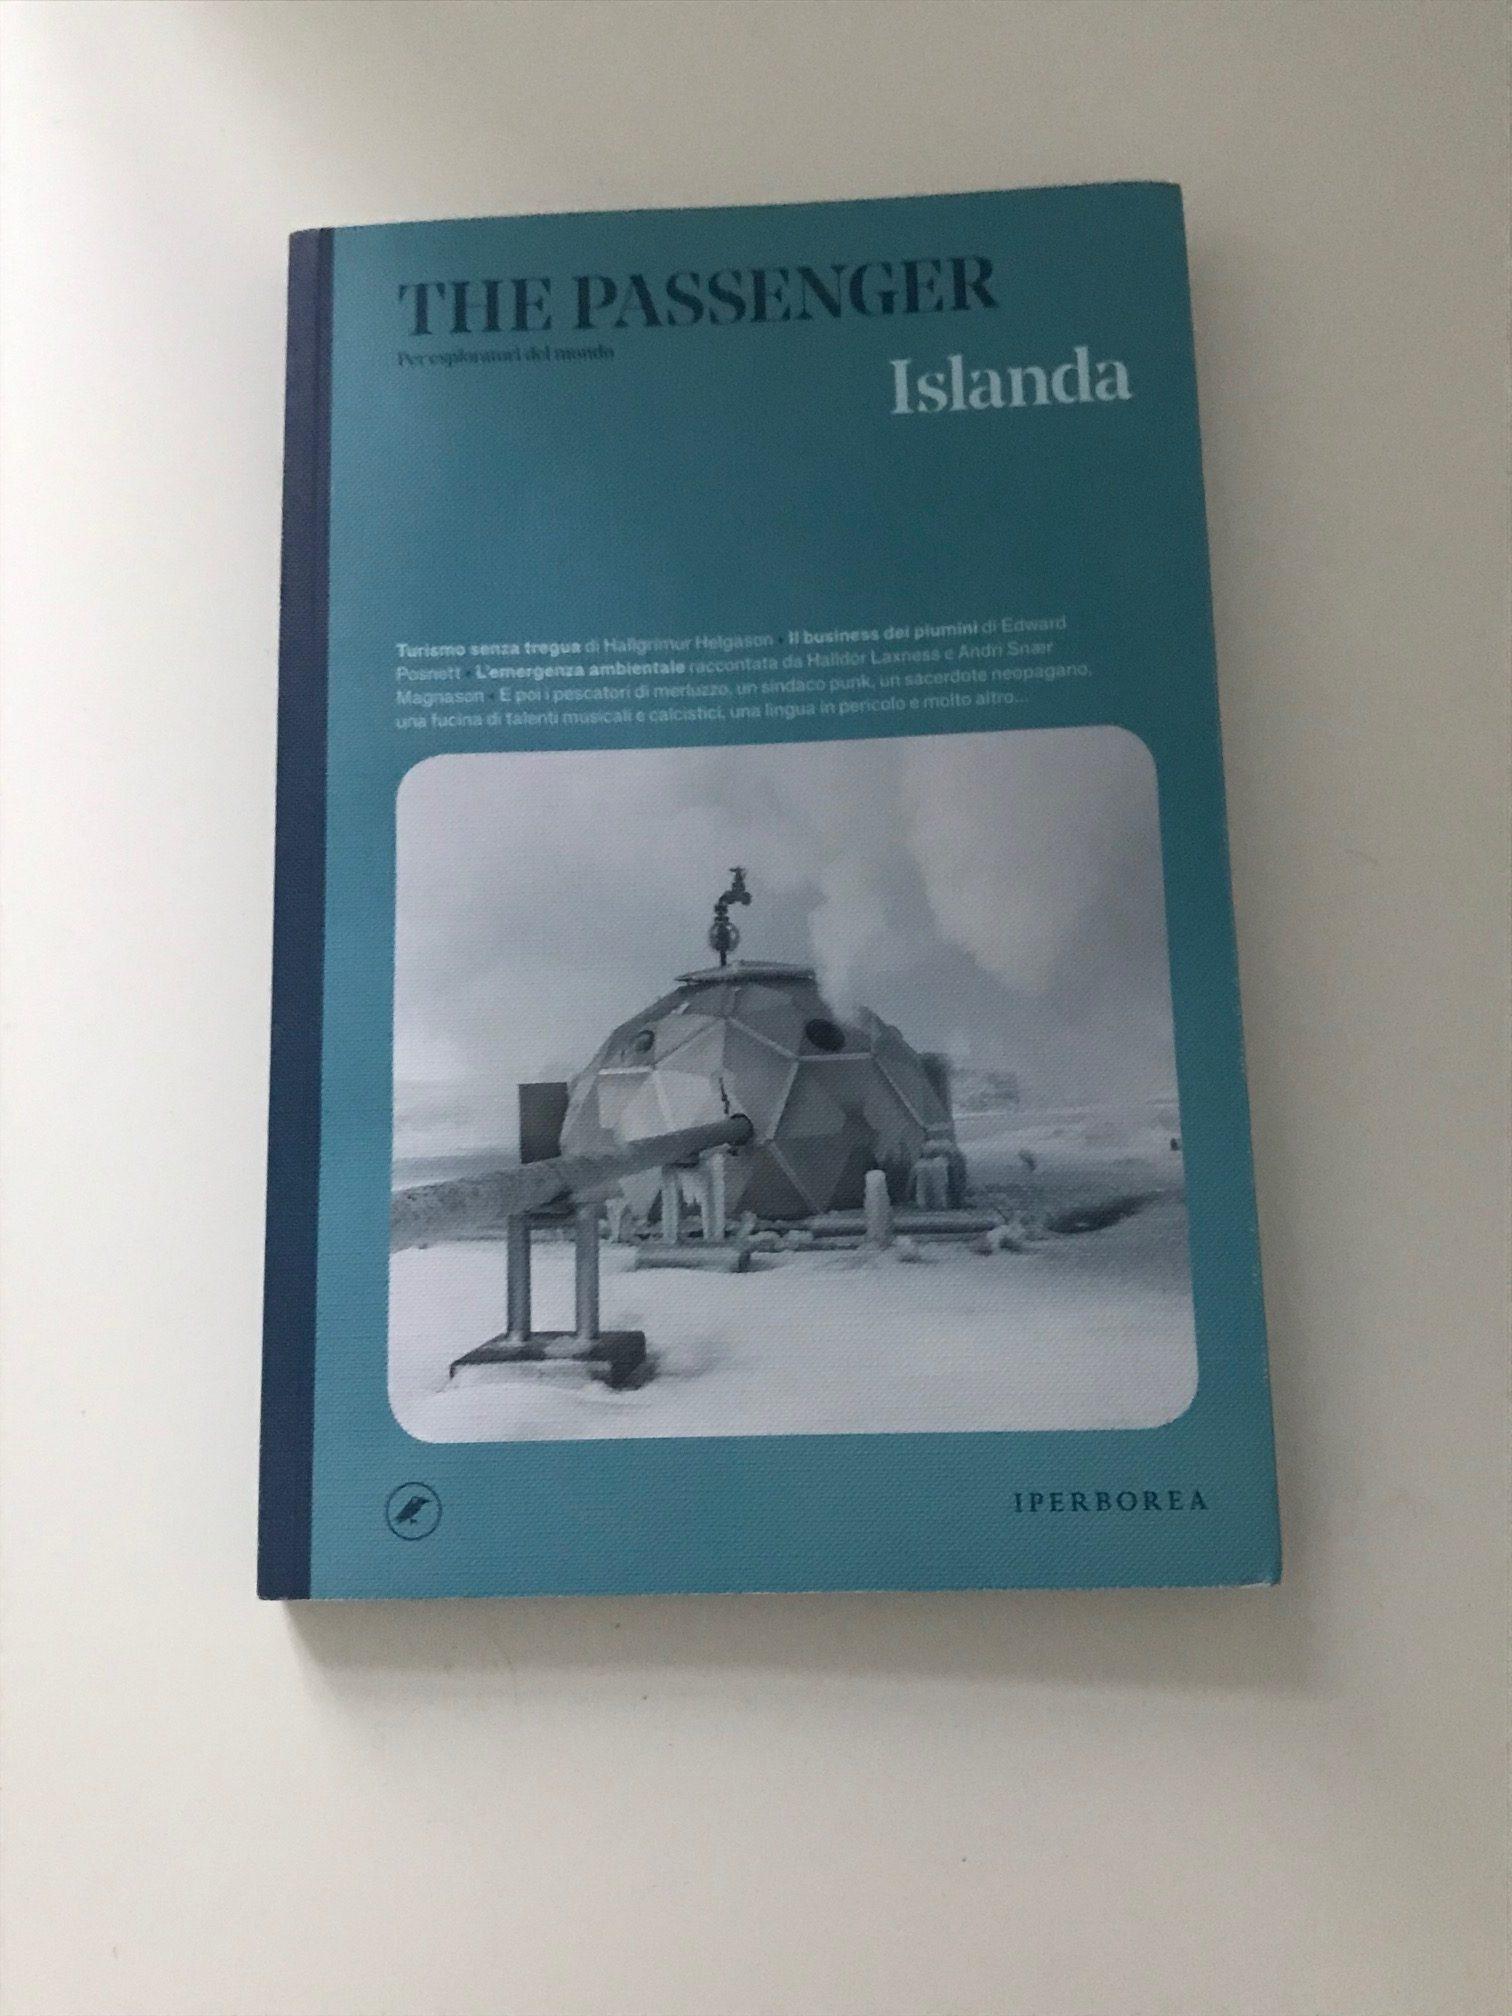 The passenger Islanda